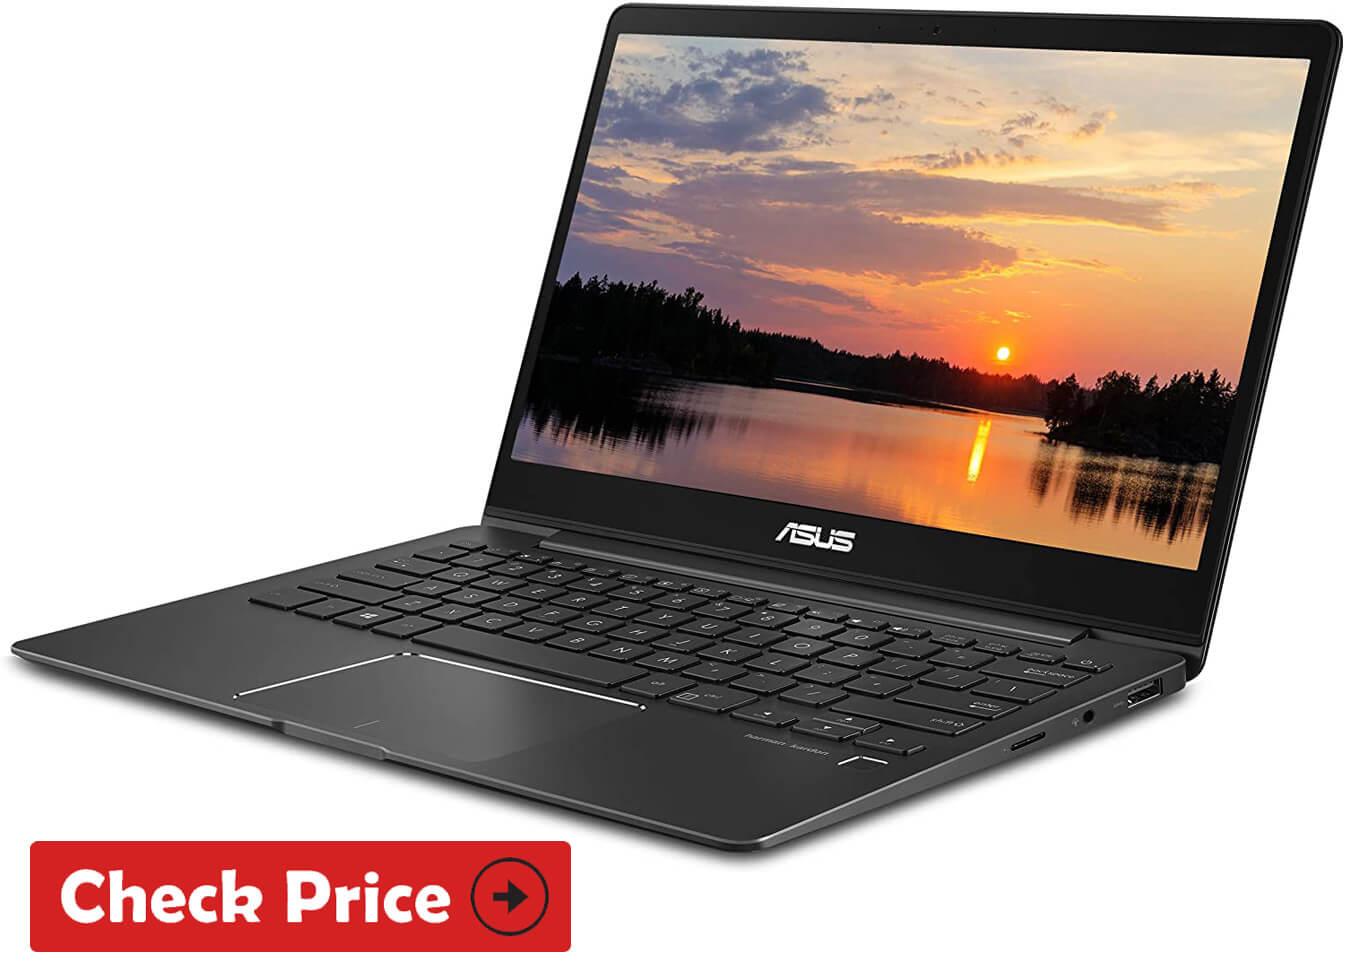 ASUS ZenBook 13 laptop for realtors